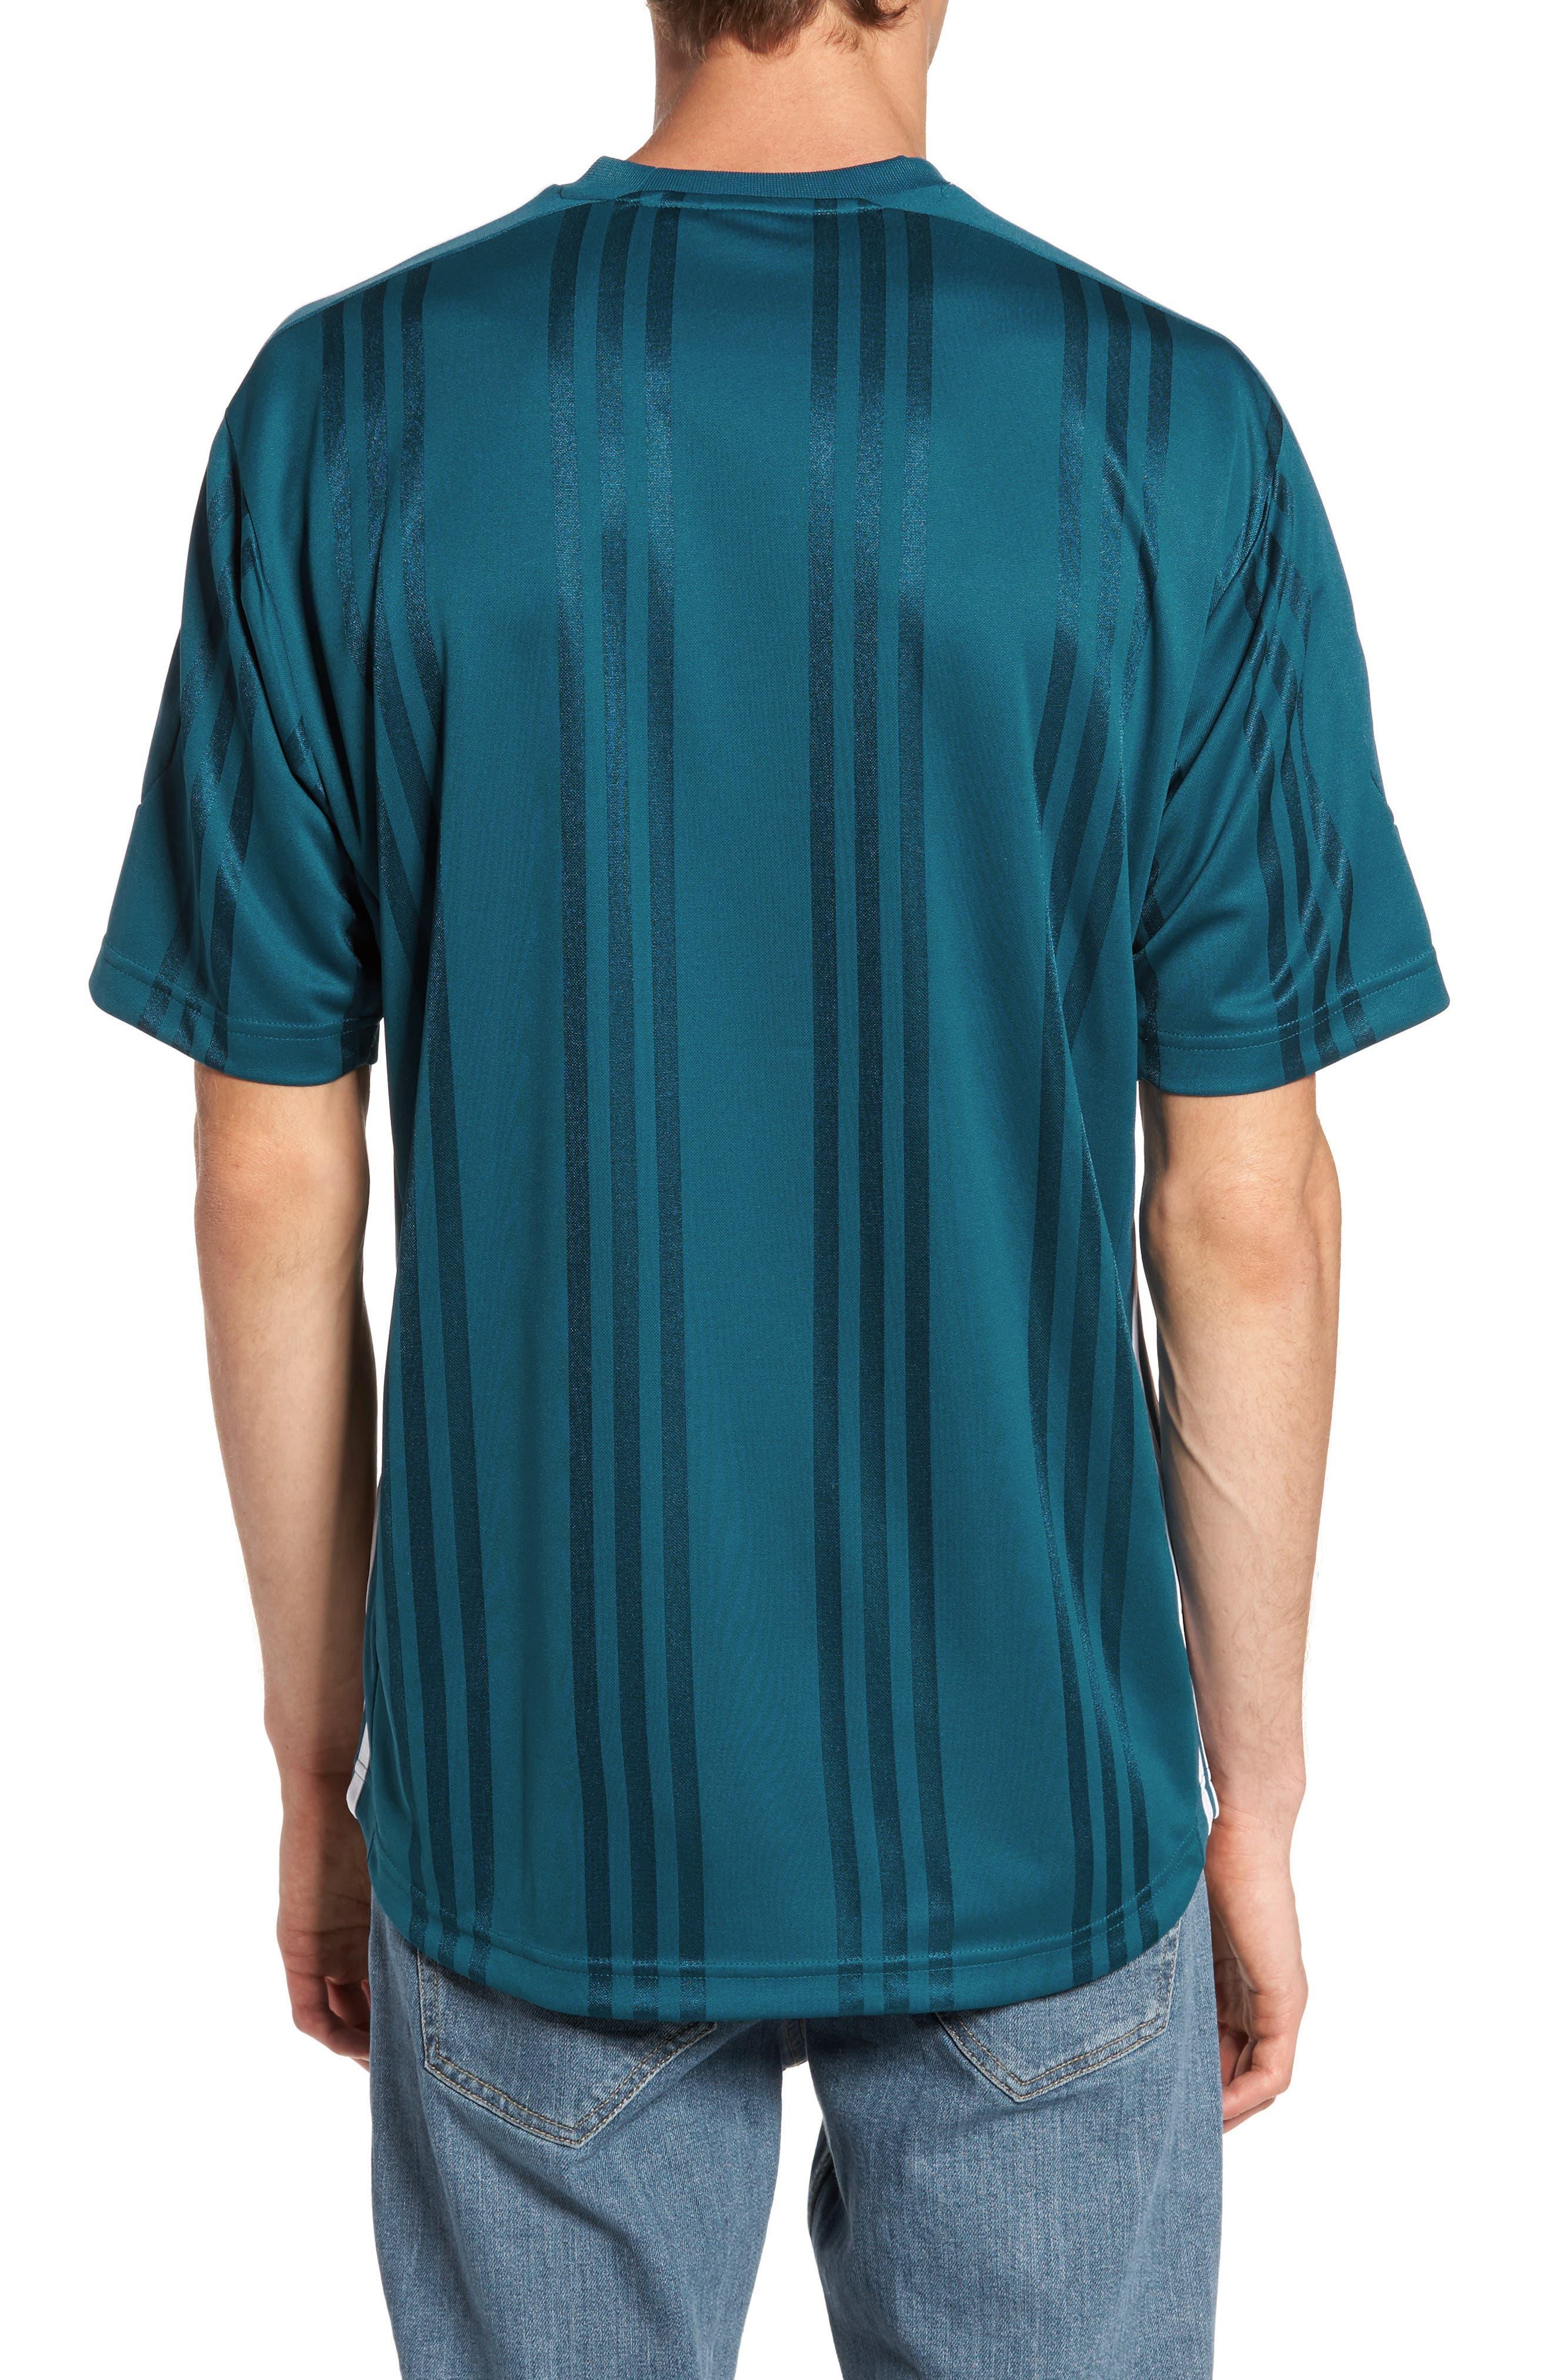 Originals Jacquard Stripe T-Shirt,                             Alternate thumbnail 6, color,